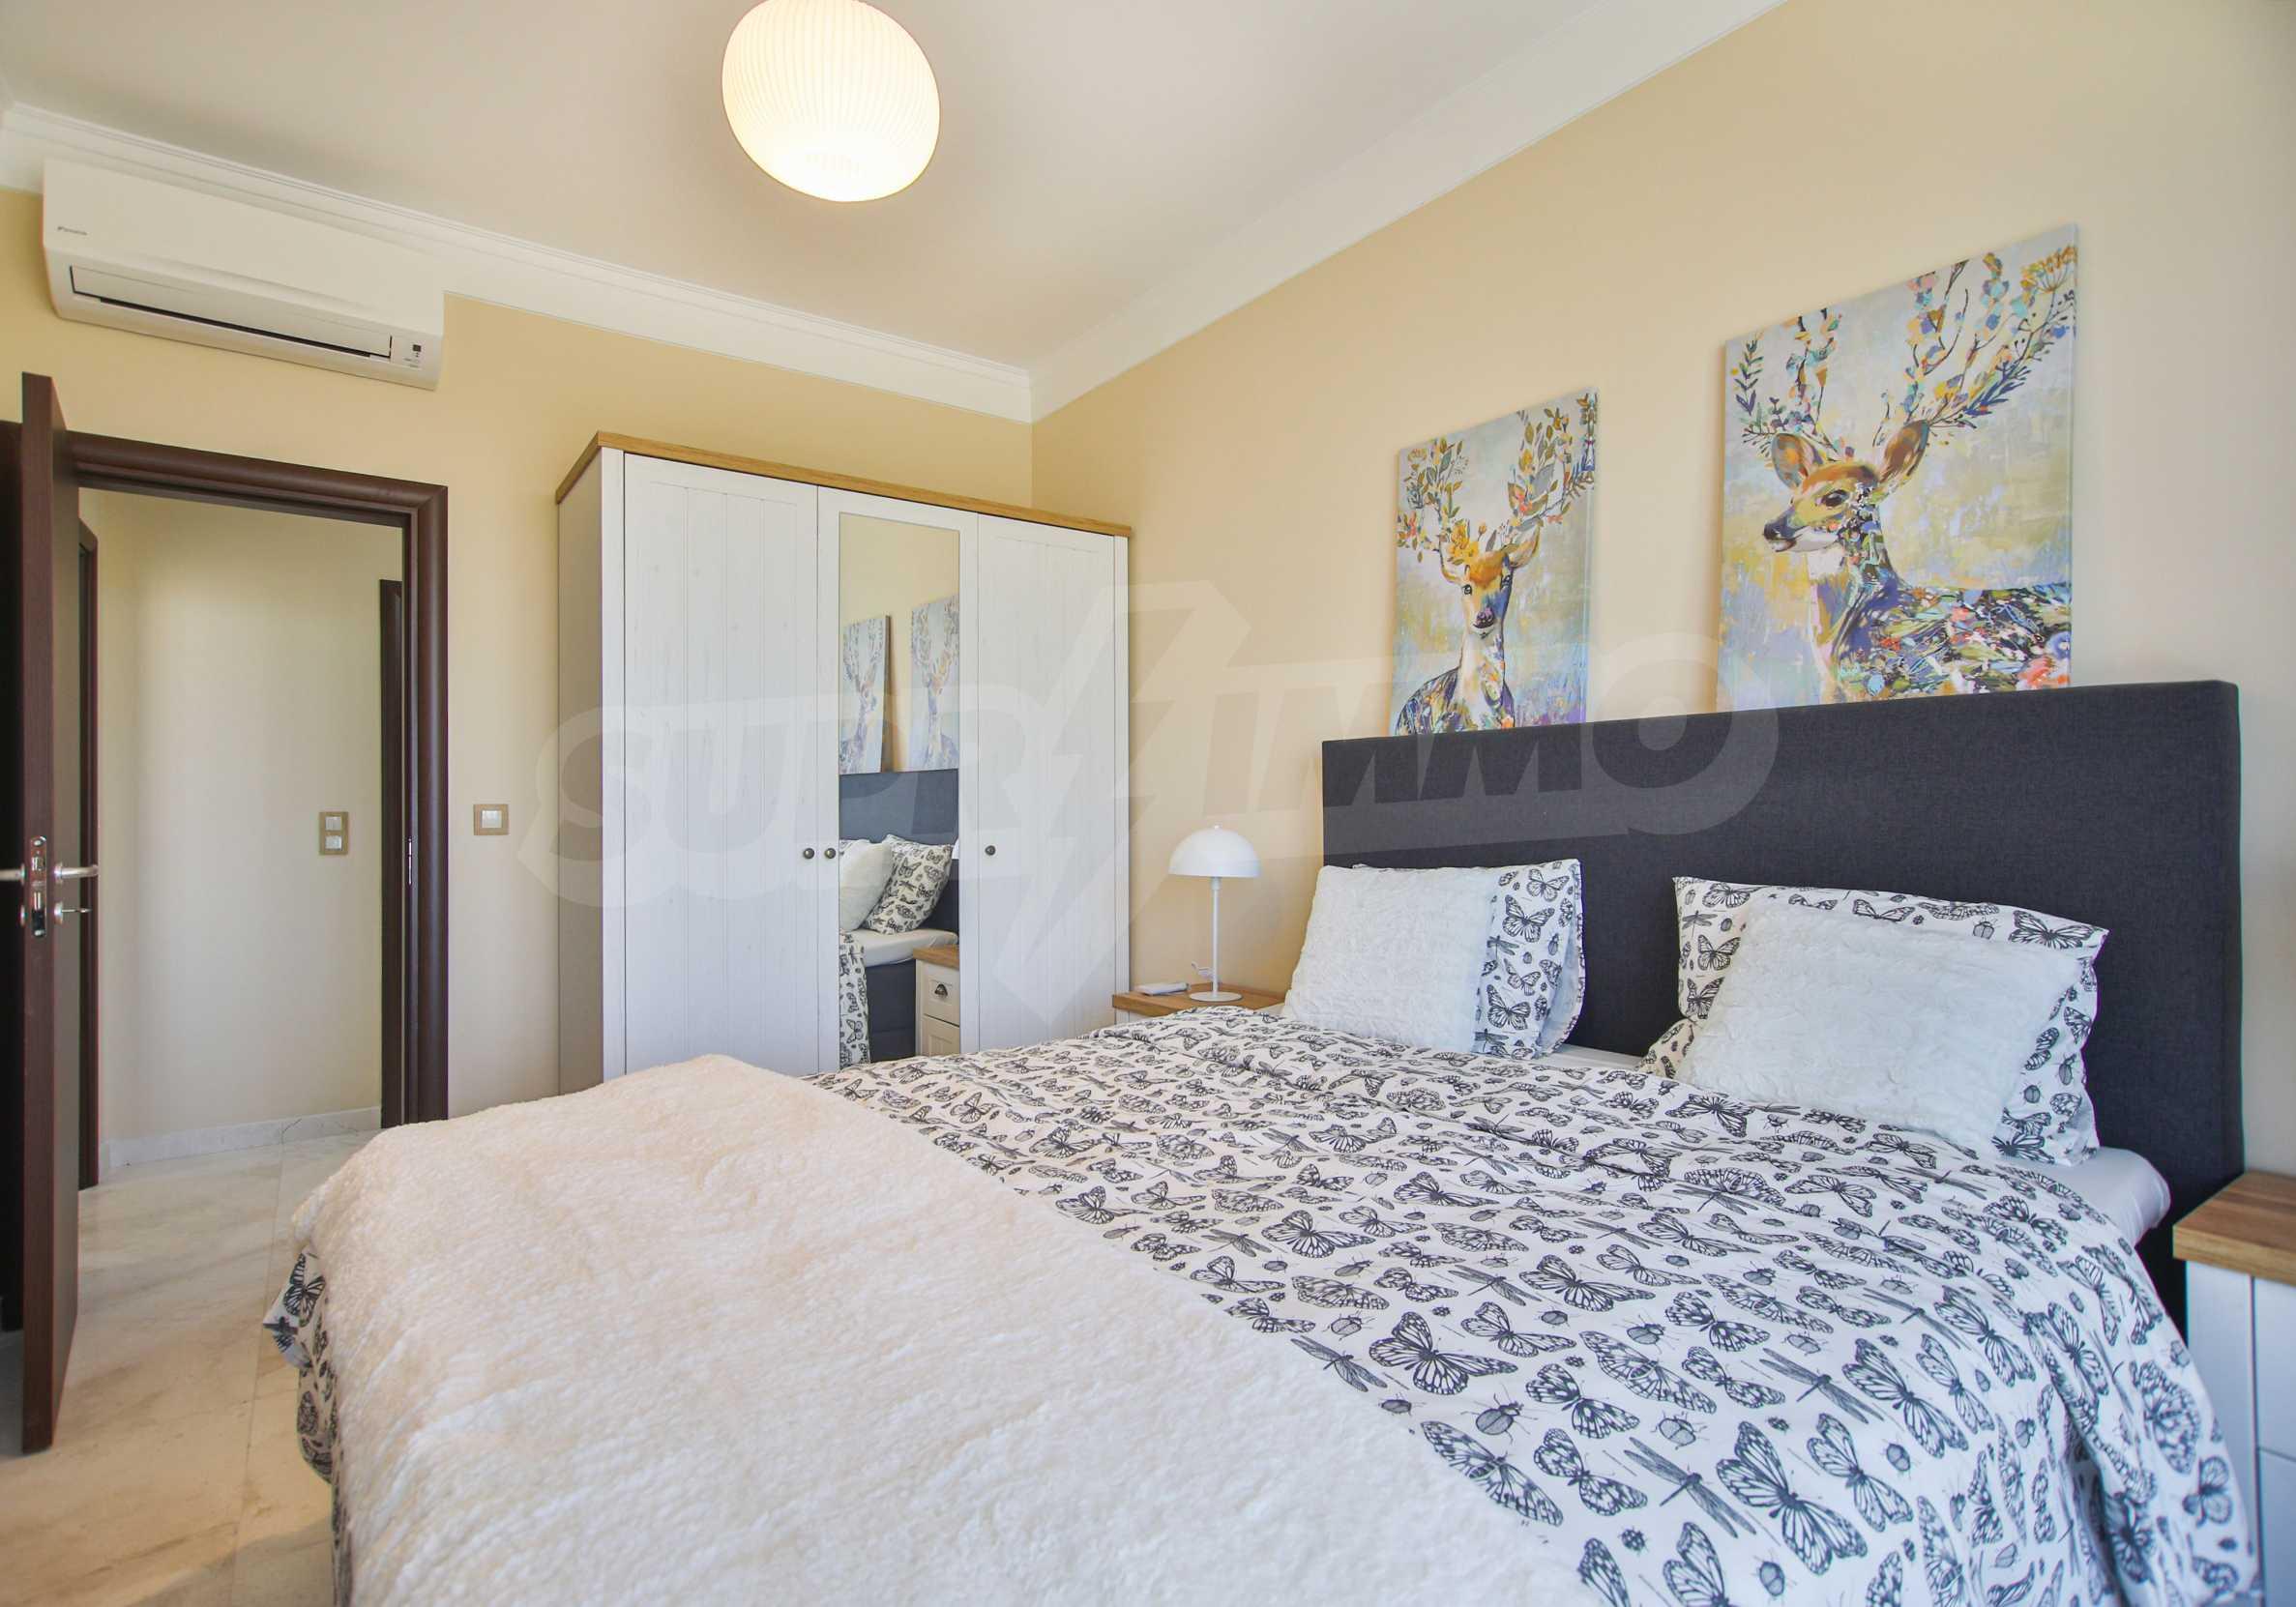 Първокласен двустаен апартамент в Belle Époque Beach Residence (ап. №A 206) 8